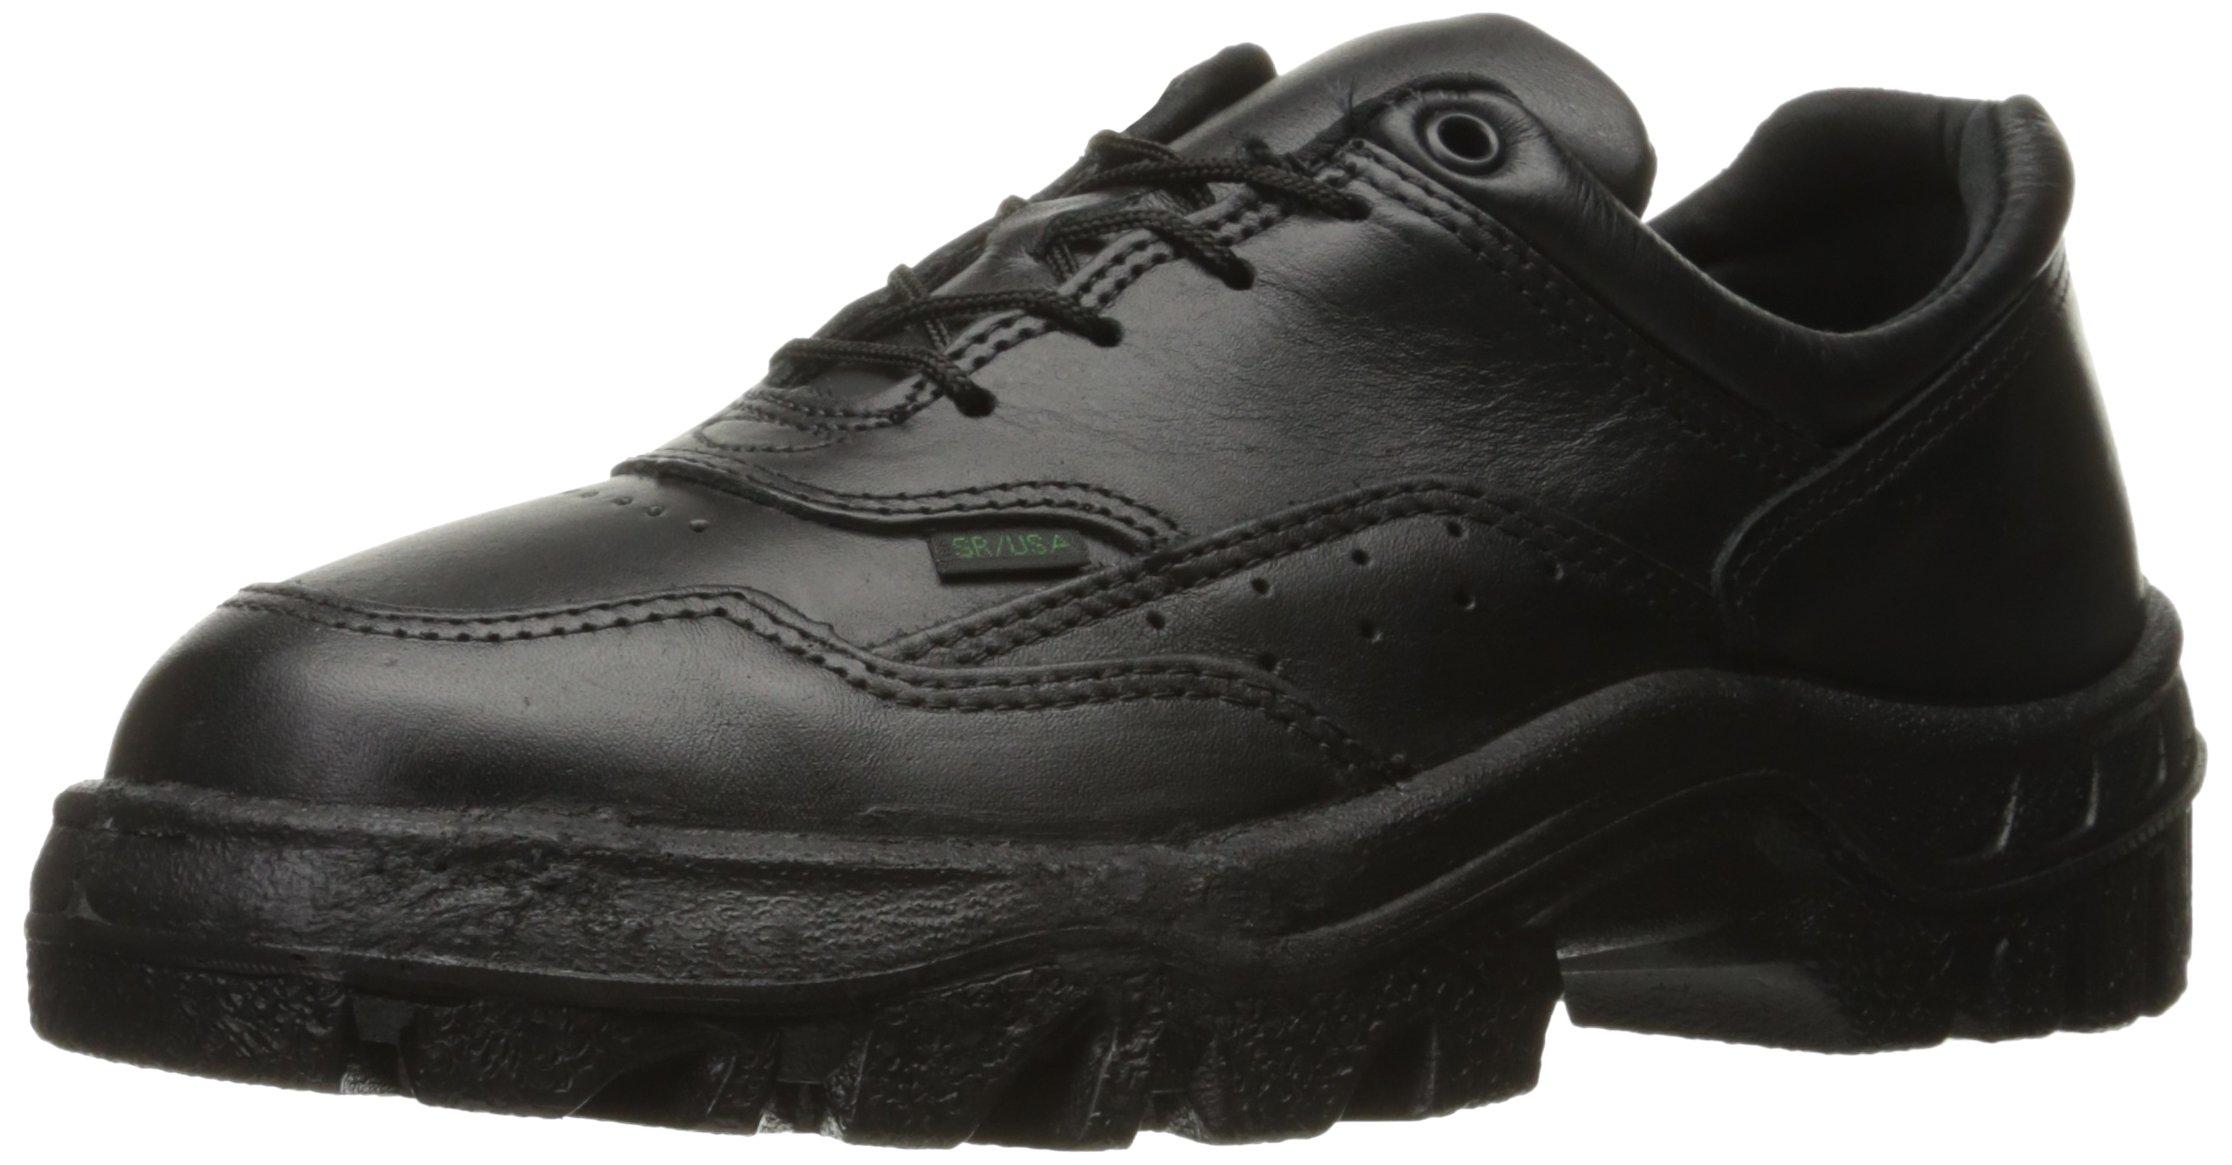 Rocky Women's 4 Inch Women's Postal TMC 5101 Slip Resistant Work Boot,Black,8.5 W US